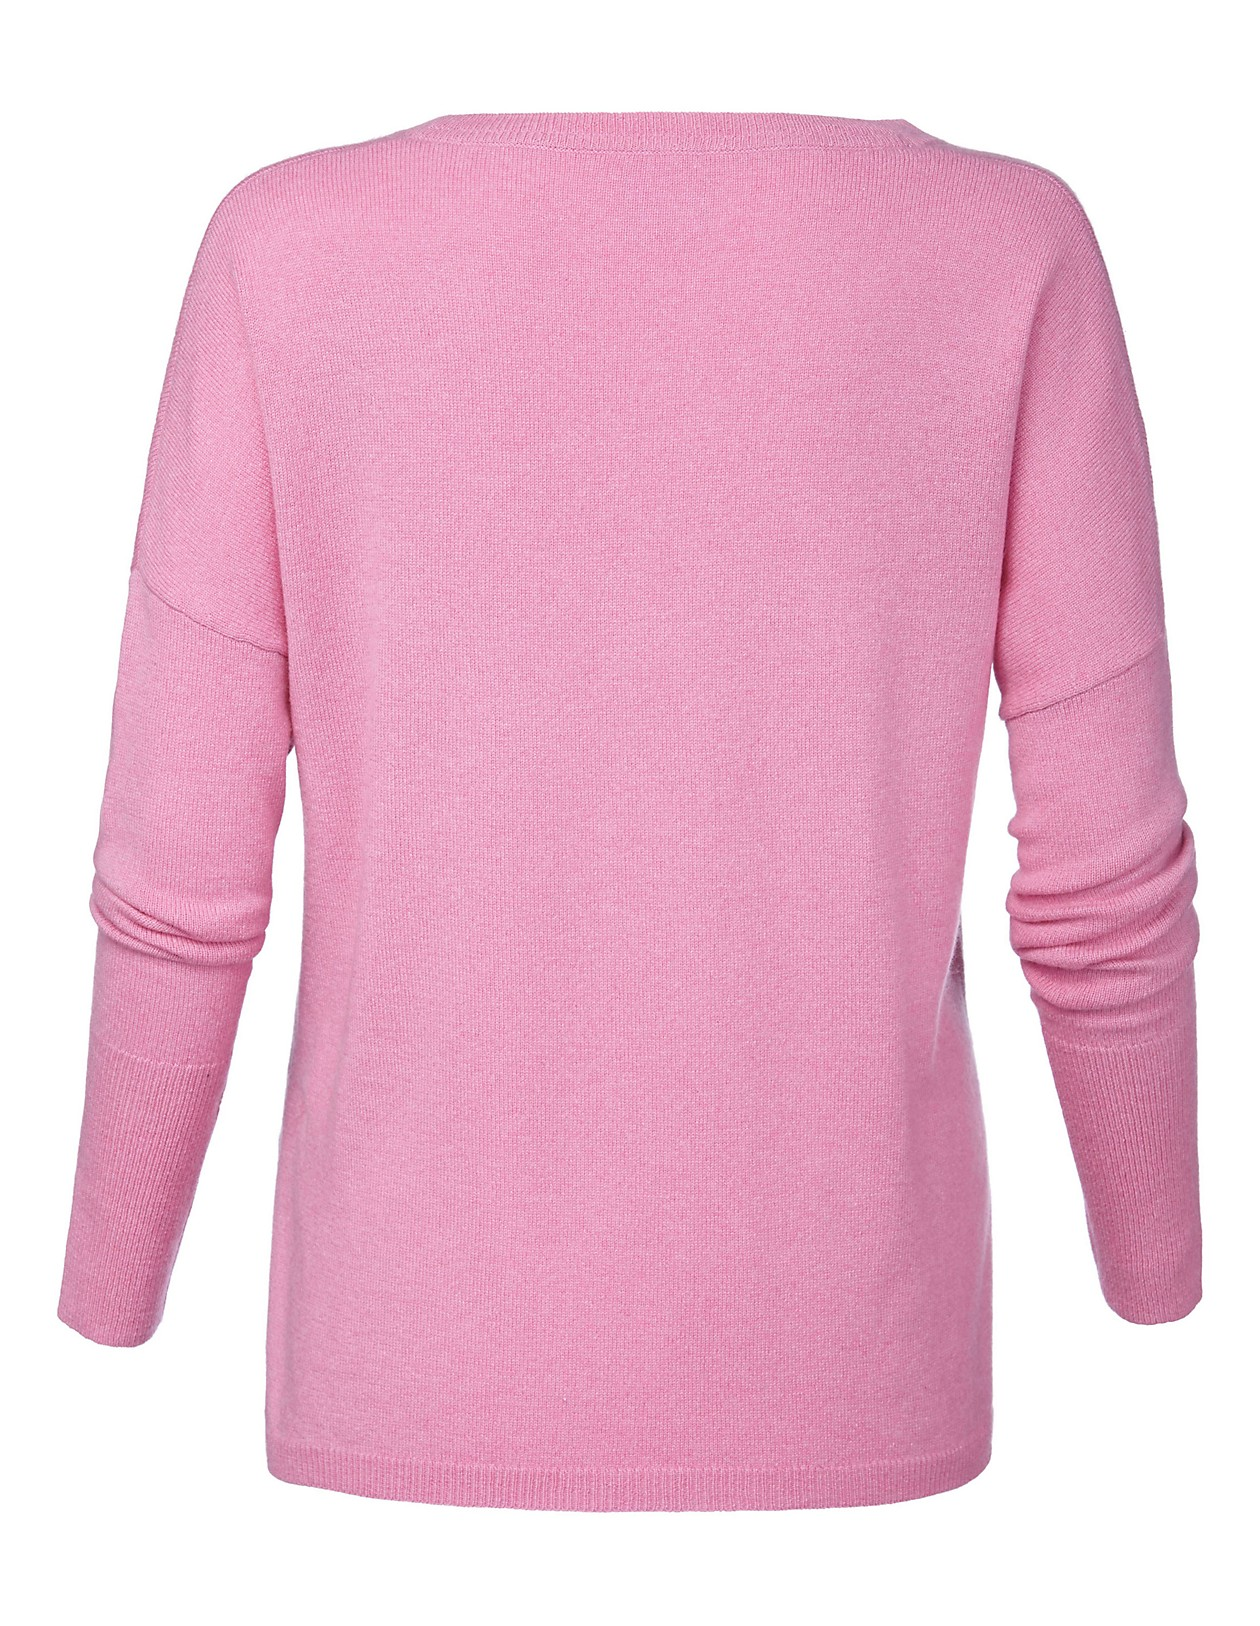 Kaschmirpullover, wildrose, rosa   MADELEINE Mode